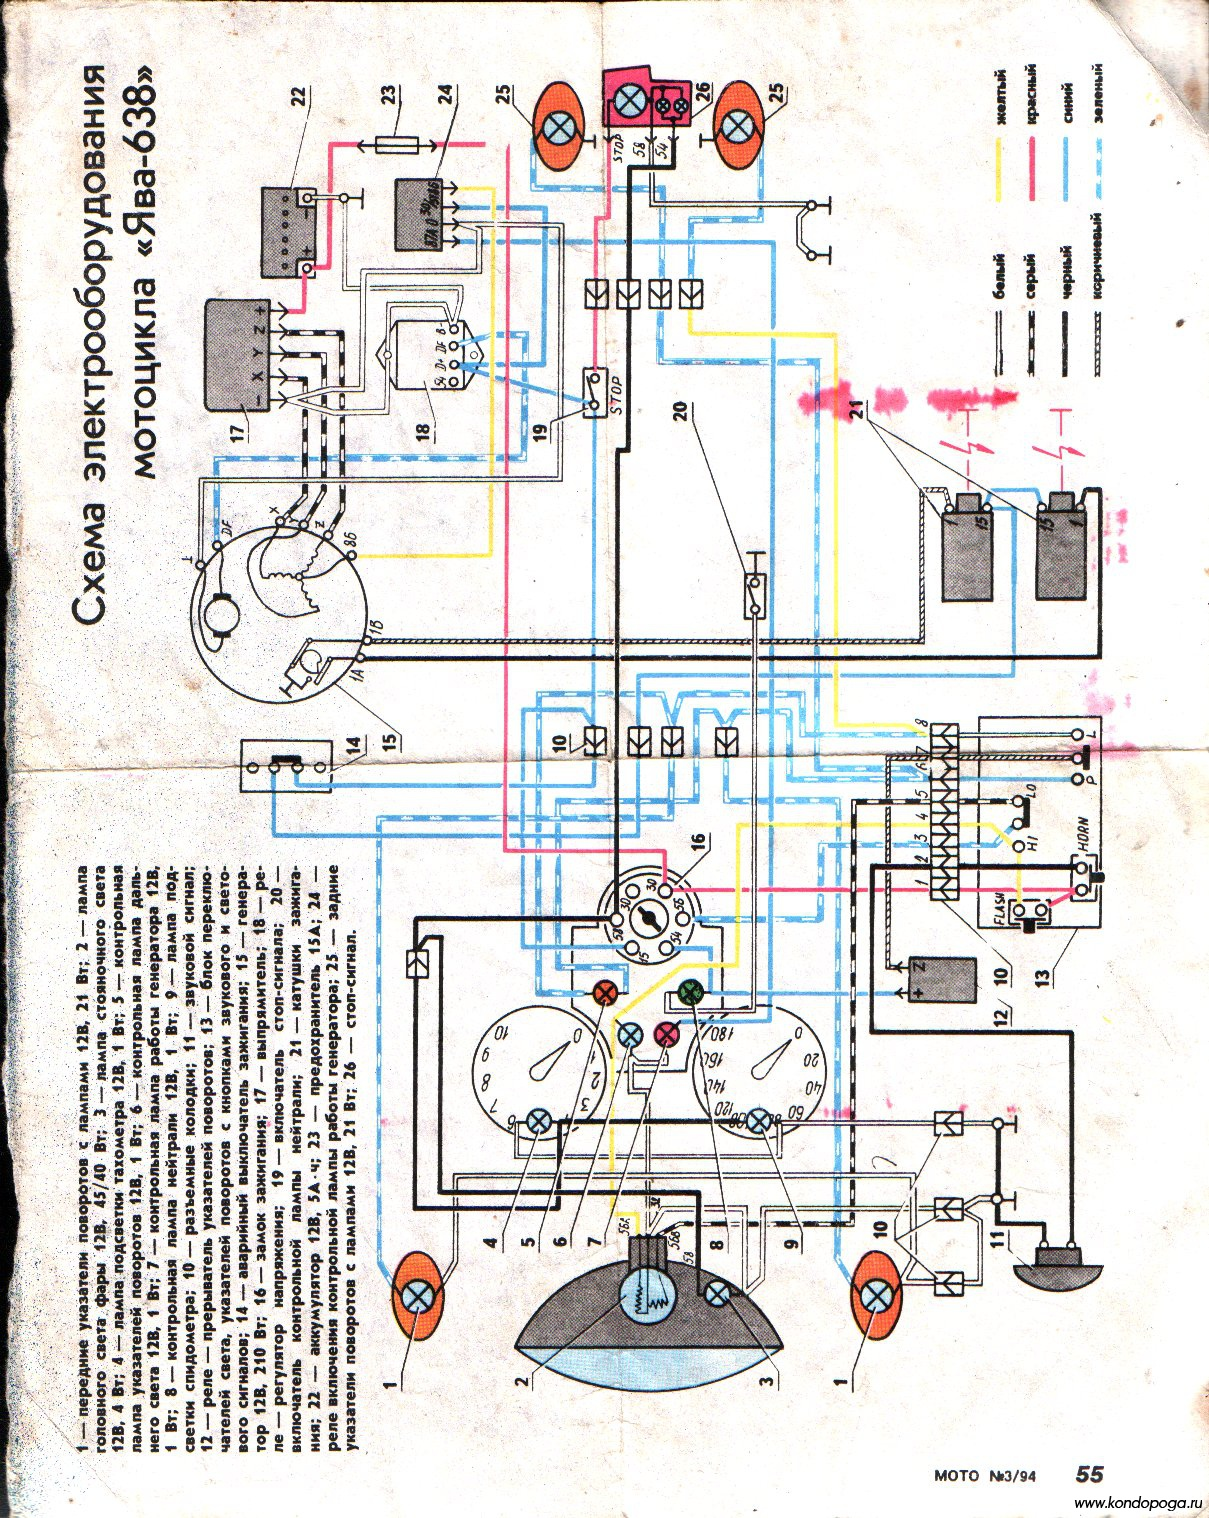 Схема проводки ява 638, замена электропроводки своими руками.